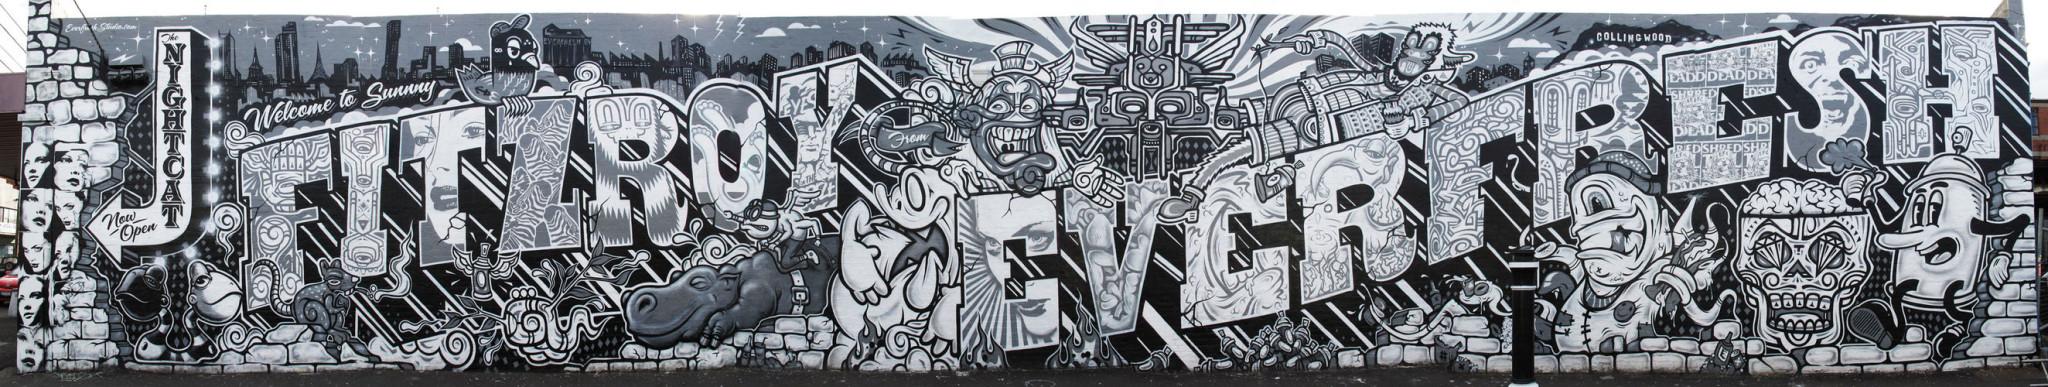 Artwork By Sync, Phibs, Rone, Mike Makatron, Reka One  (Cartoon, Long wall)